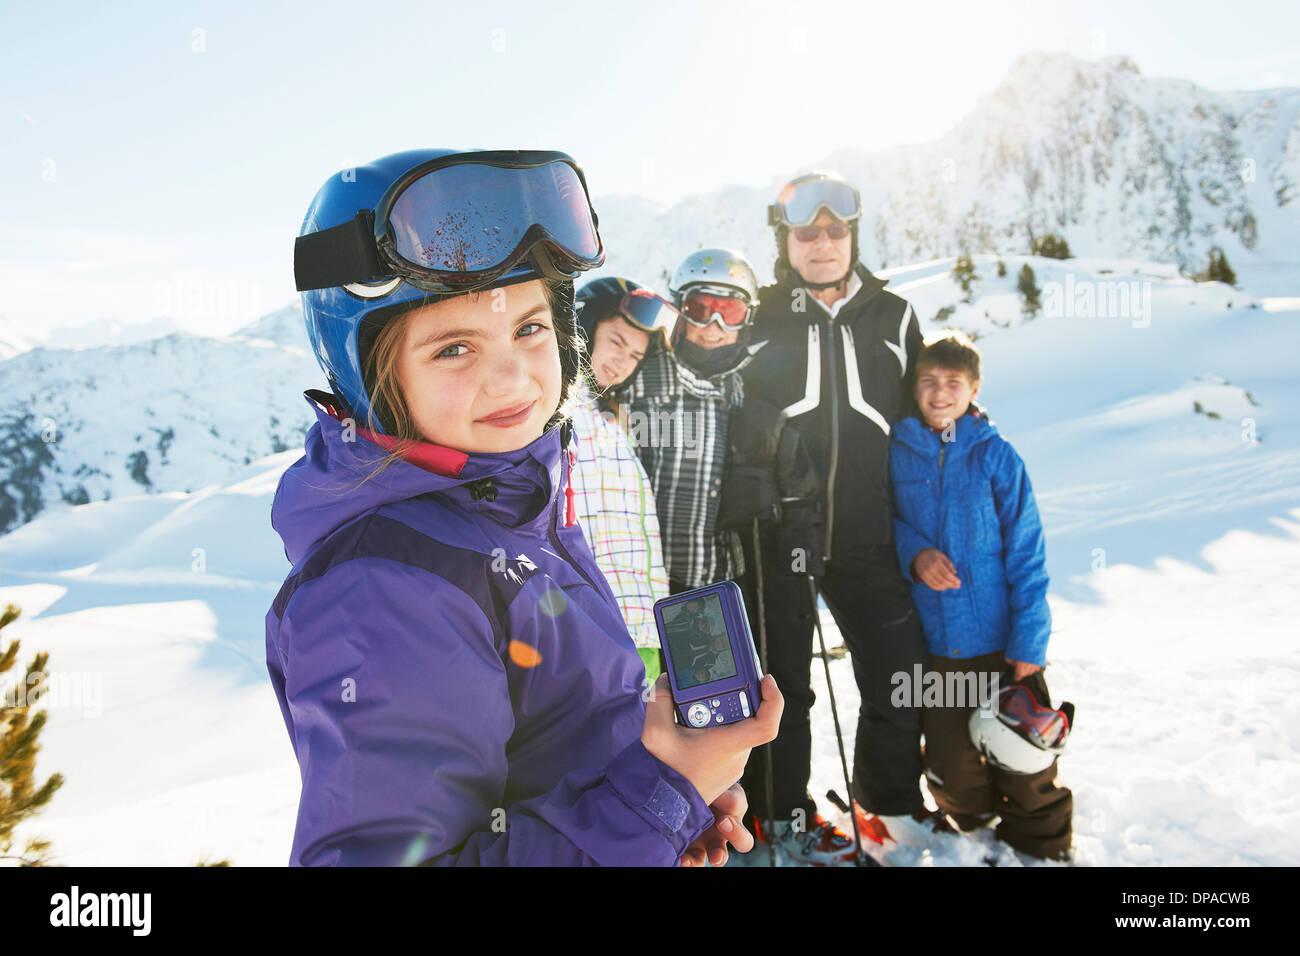 Family of skiers, Les Arcs, Haute-Savoie, France - Stock Image